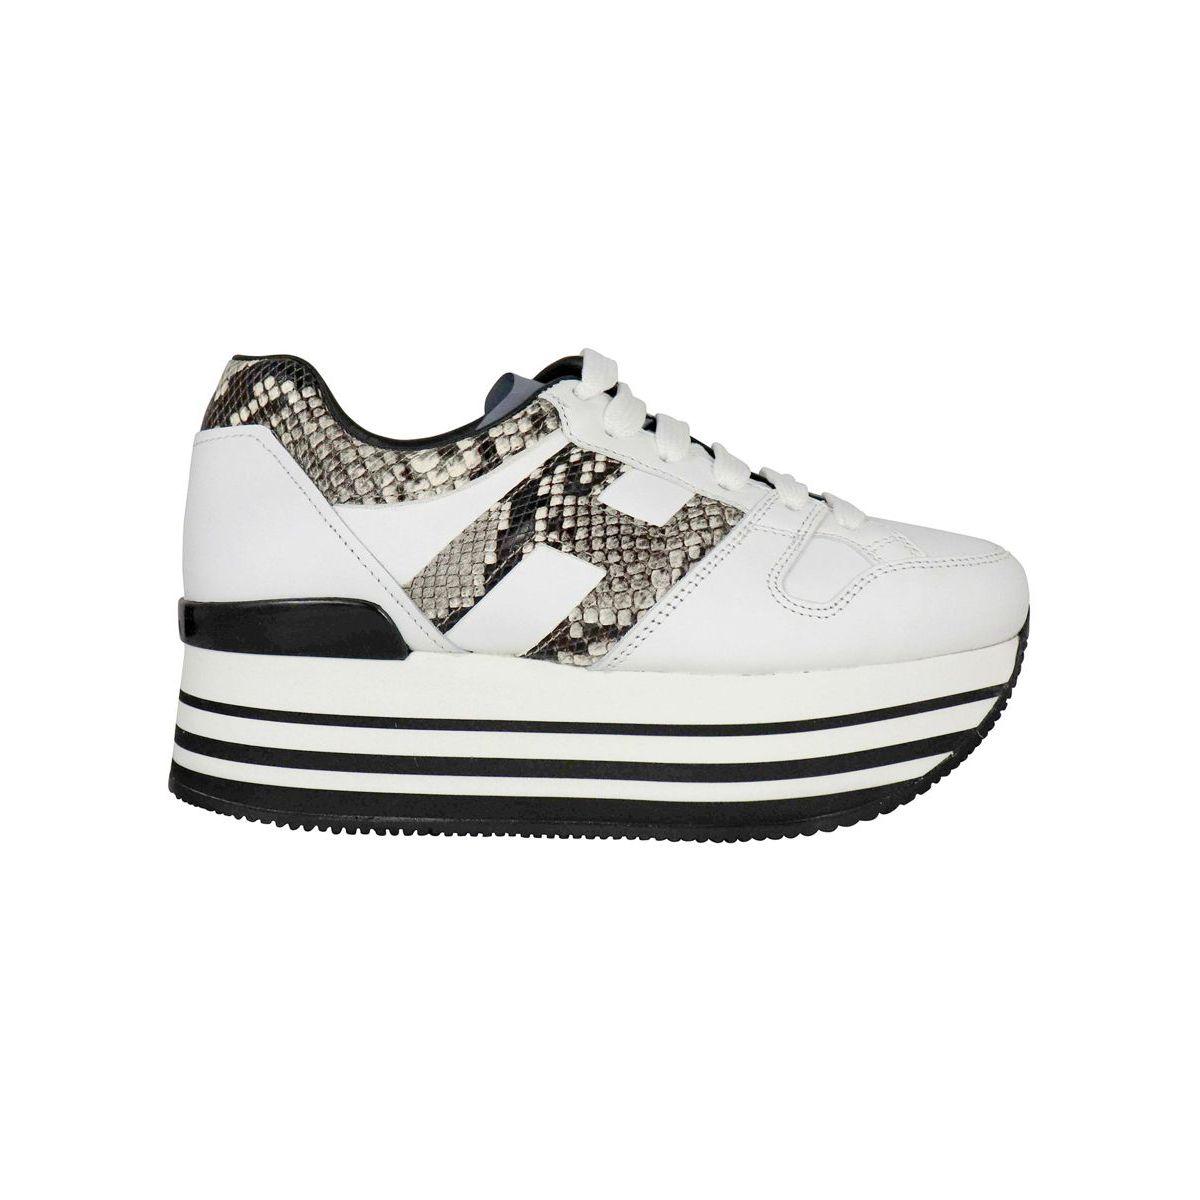 bianco Hogan Scarpe Sneakers In Pelle H283 Maxi 222